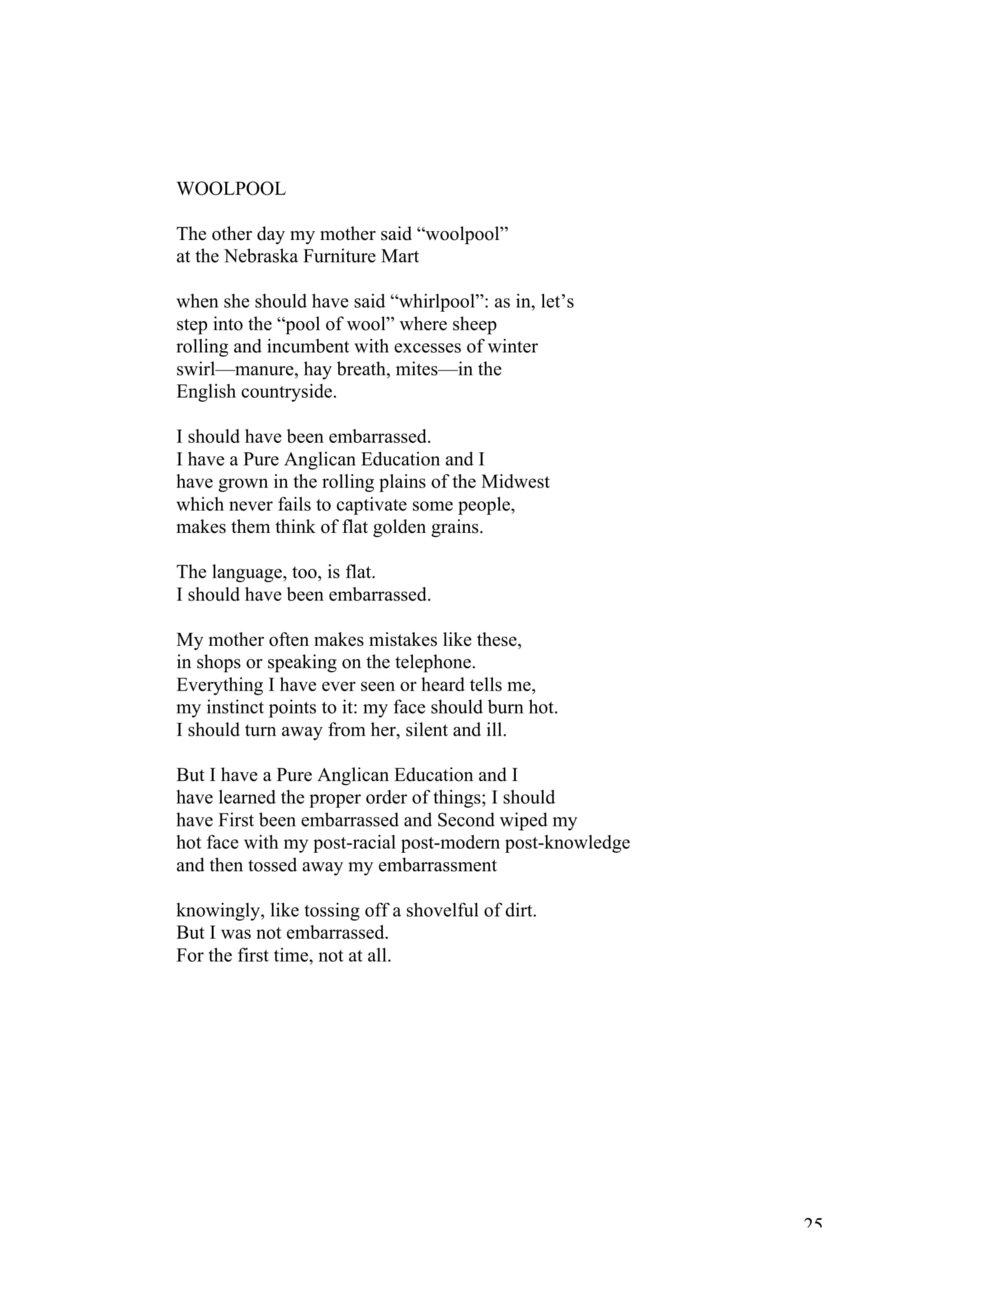 2017.10.31 UNWINDING PAGE-25.jpg